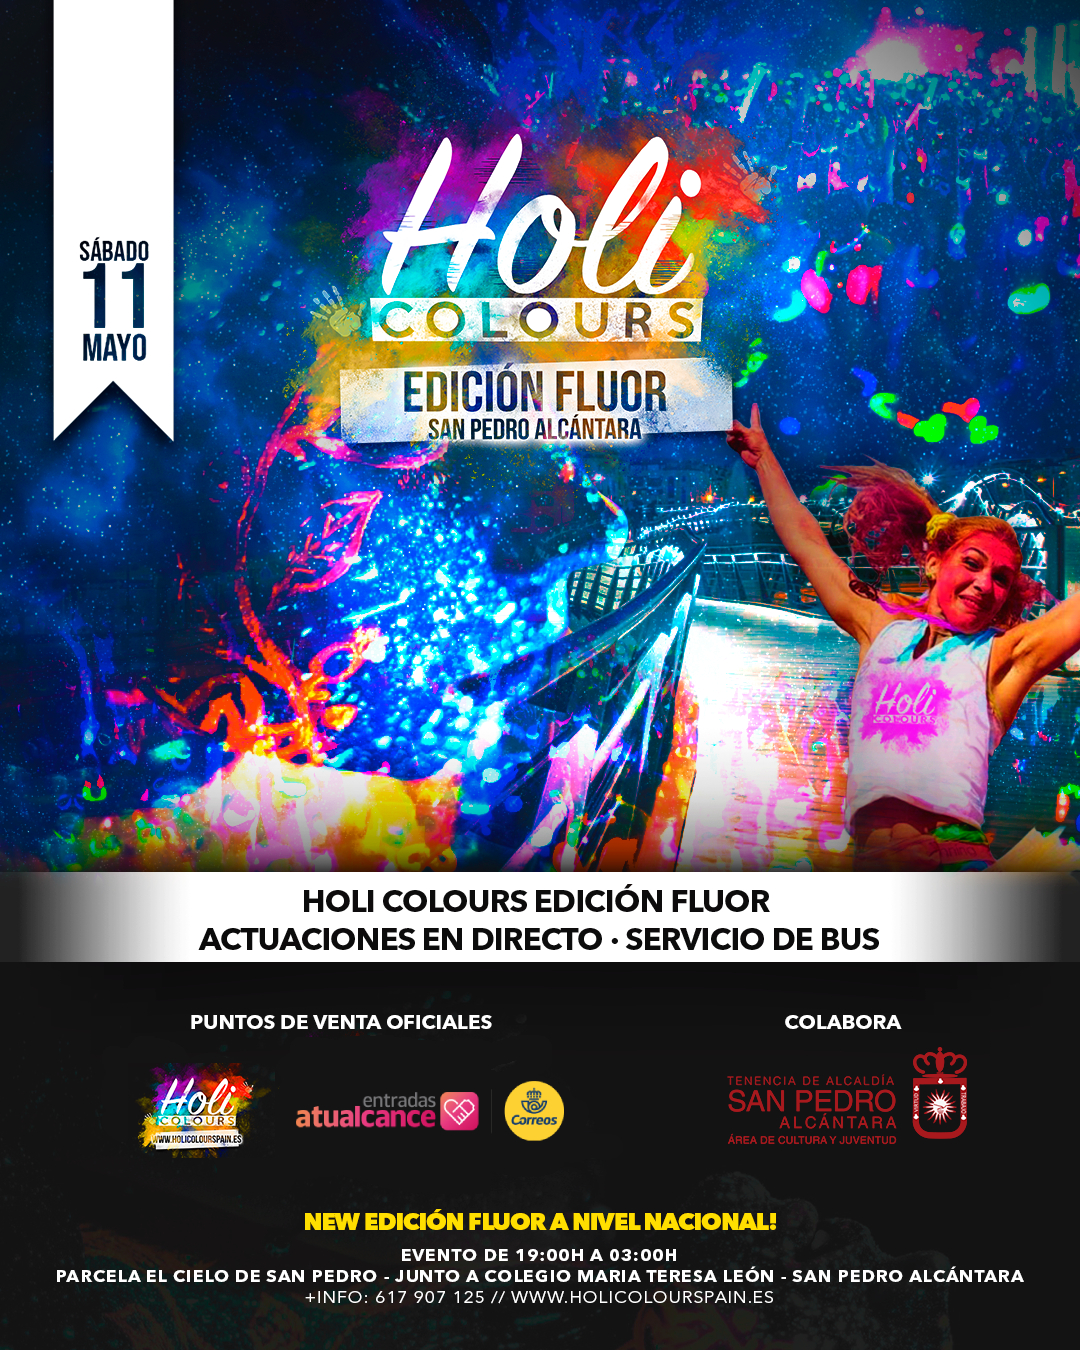 holi-colours-fluor-san-pedro-alcantara-5